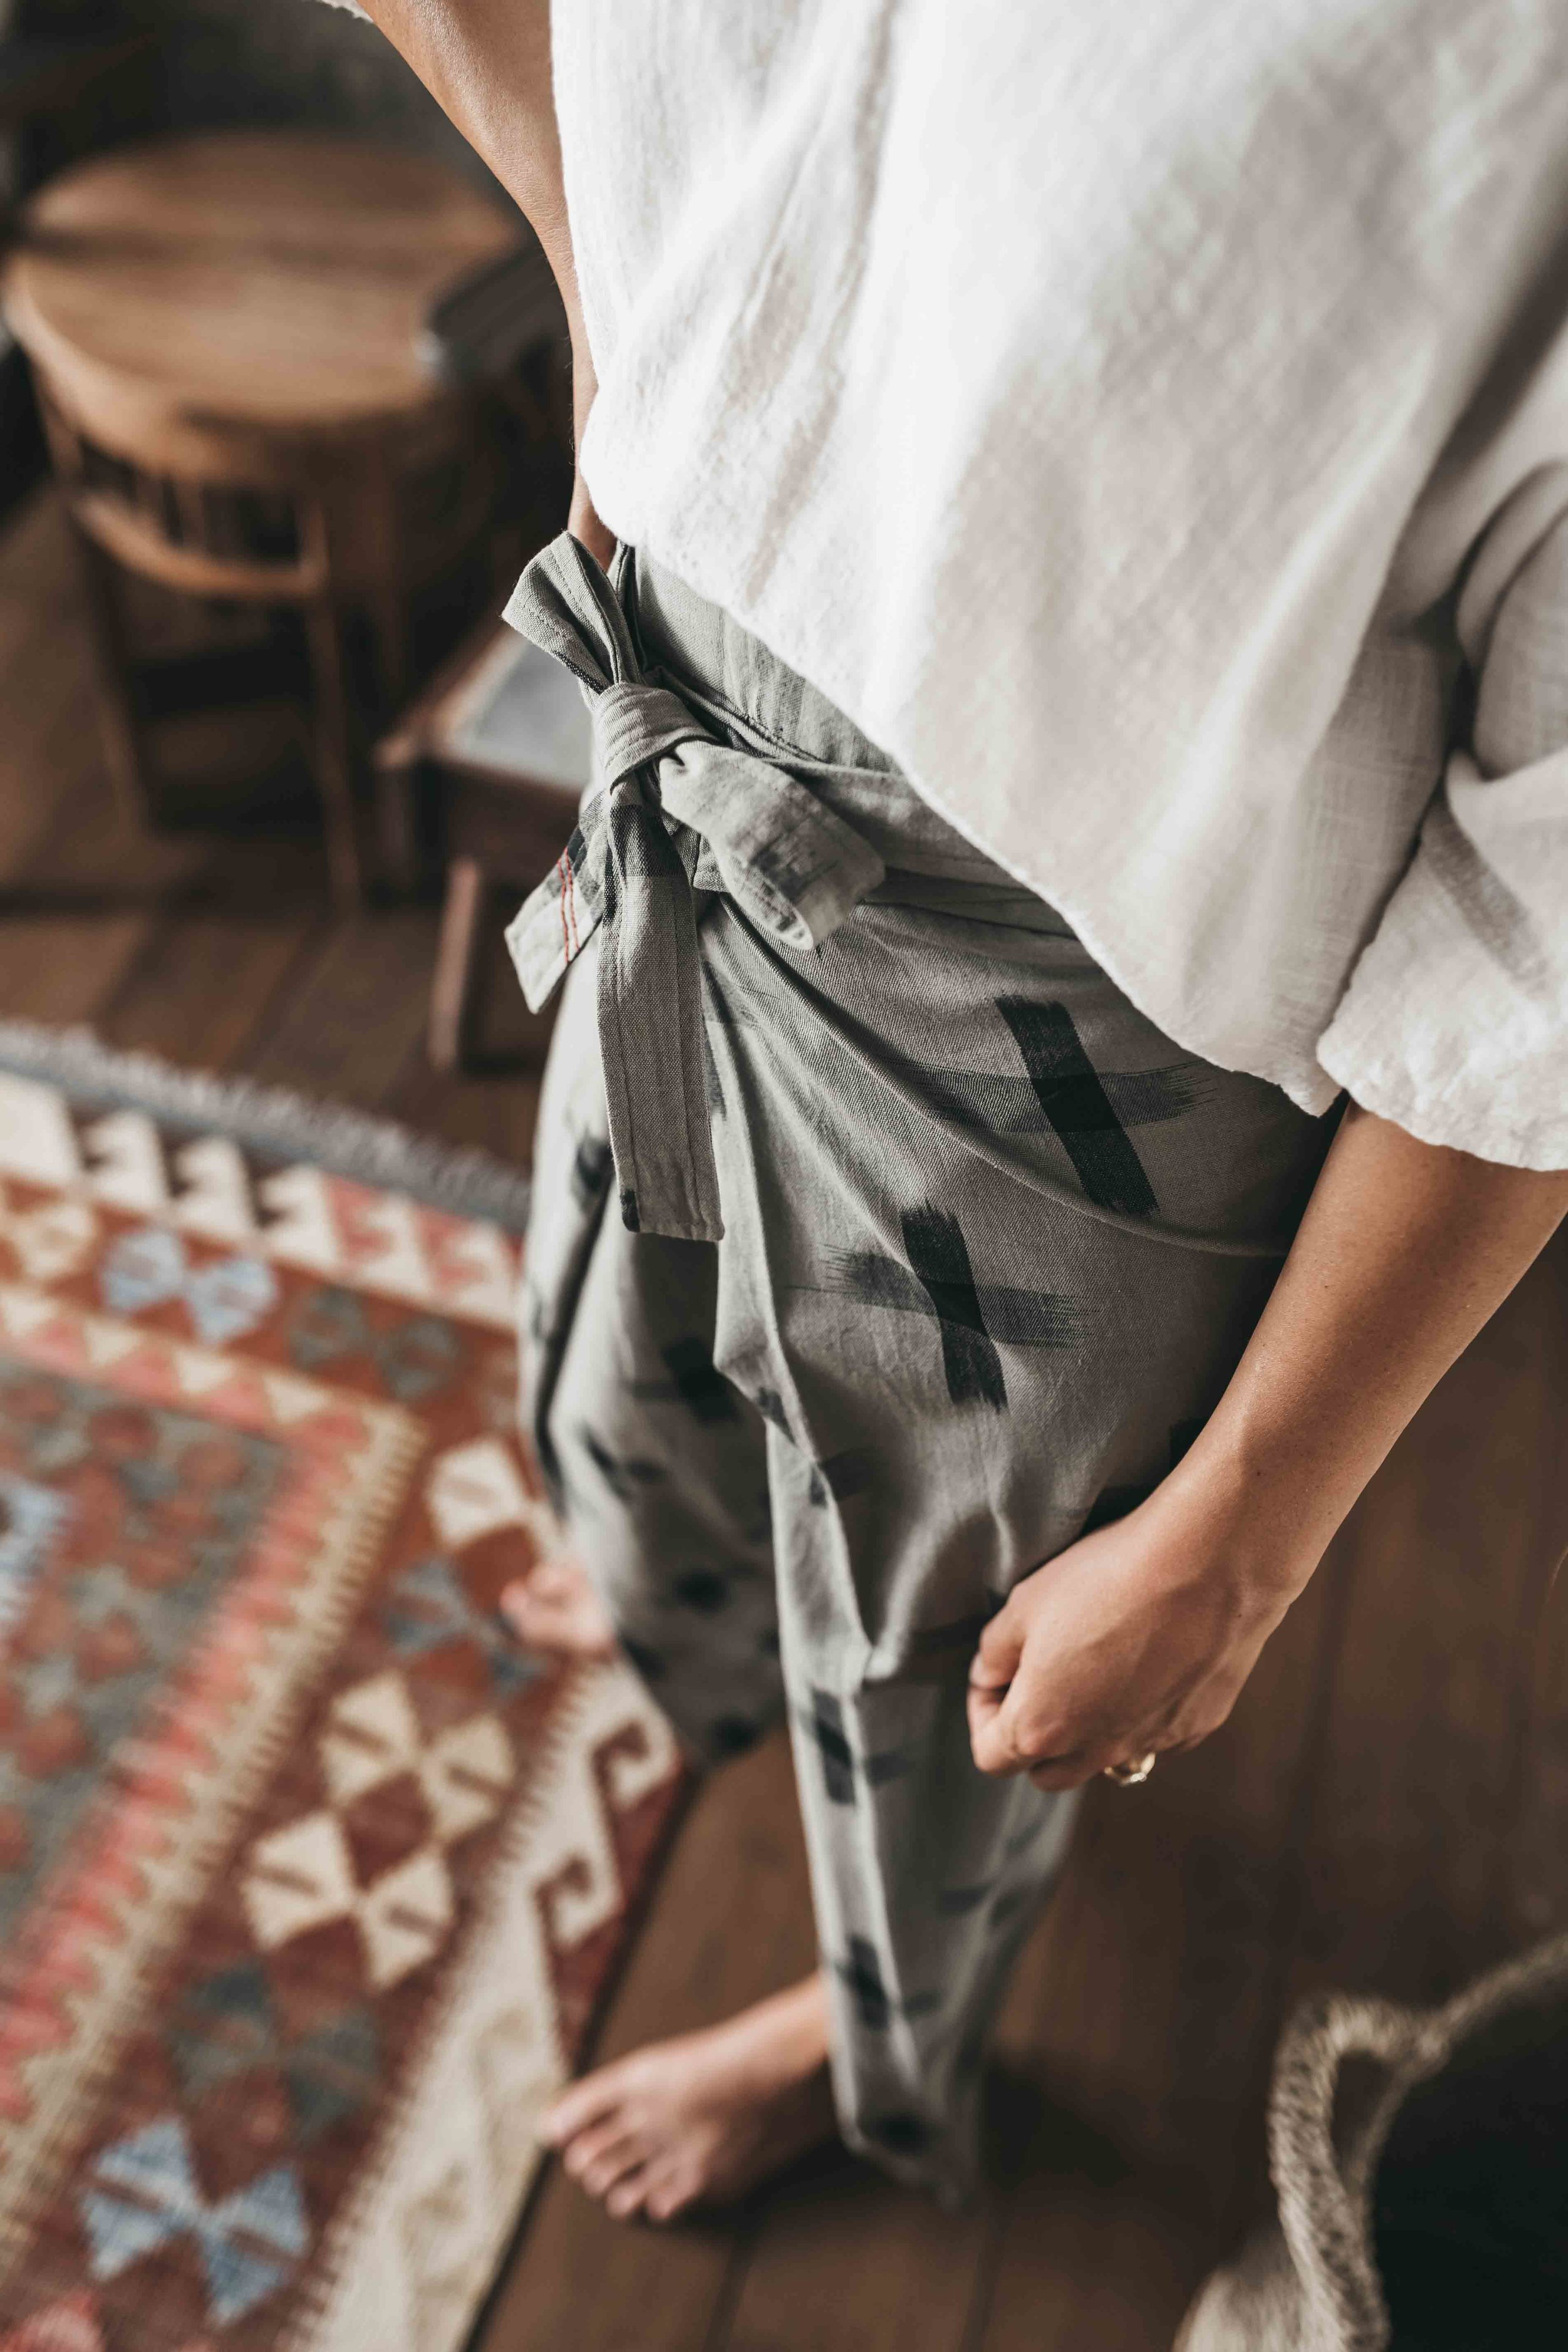 Keira-Mason-Matter-Prints-patterns-pants.jpg